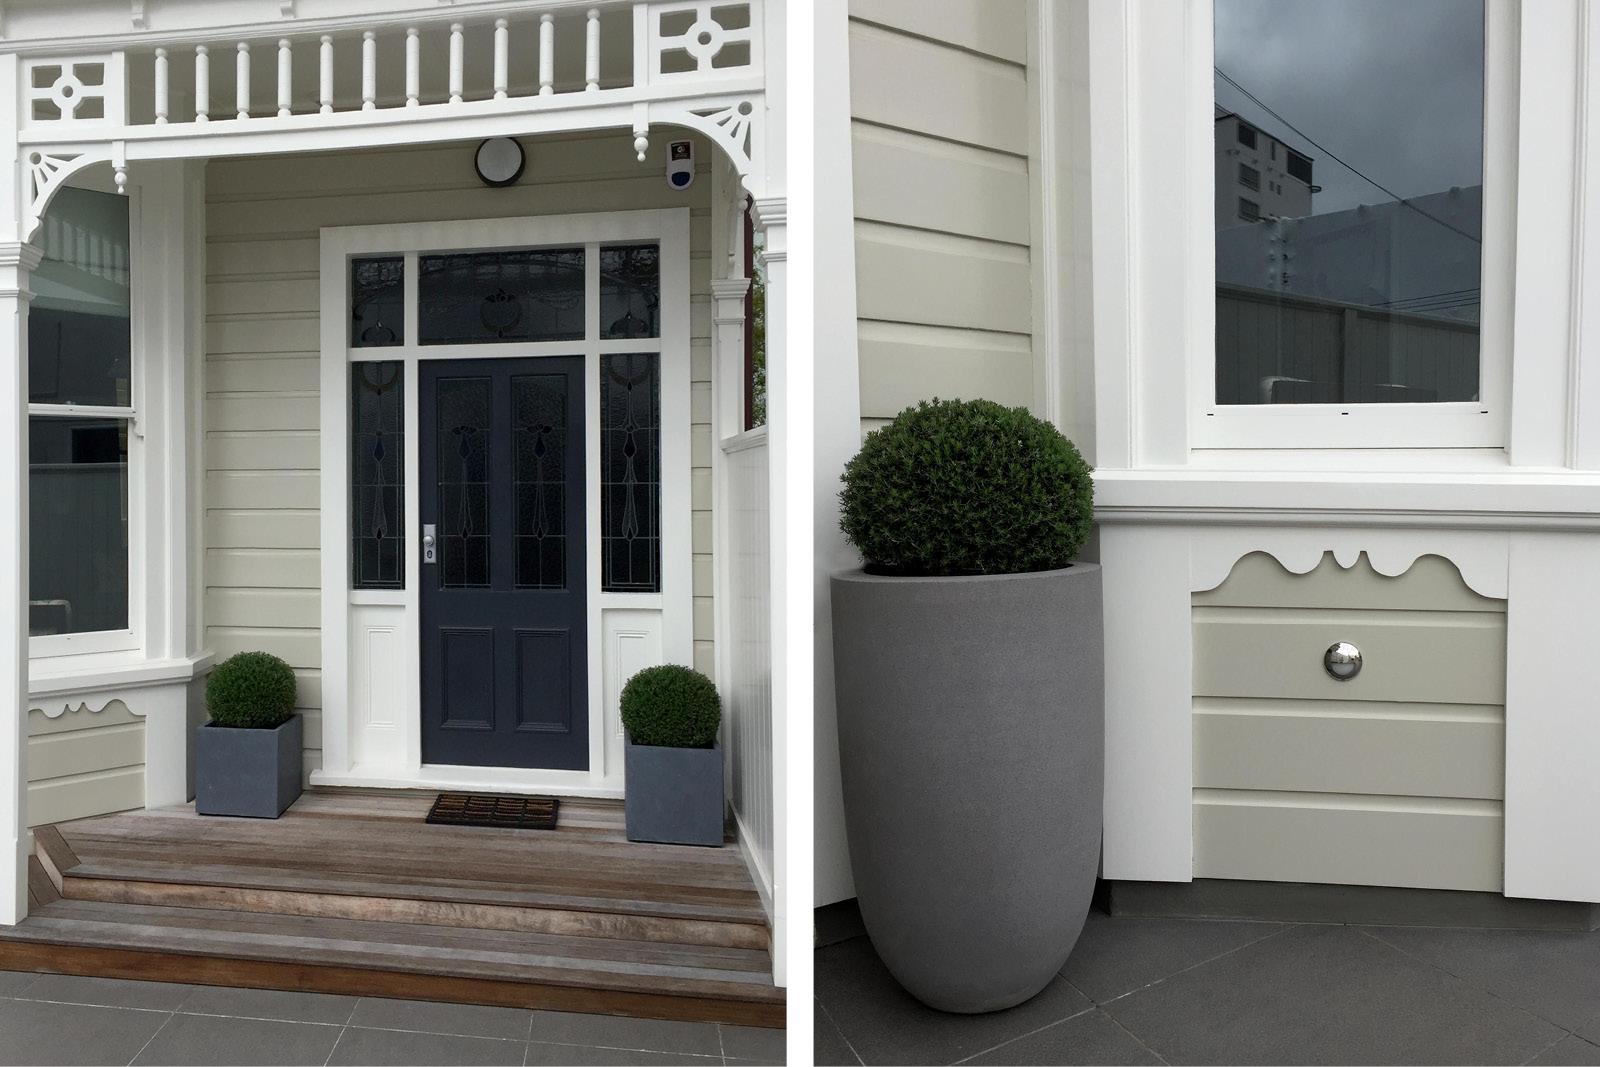 Urban_Courtyard_Formal_Garden_MNLA_5.jpg